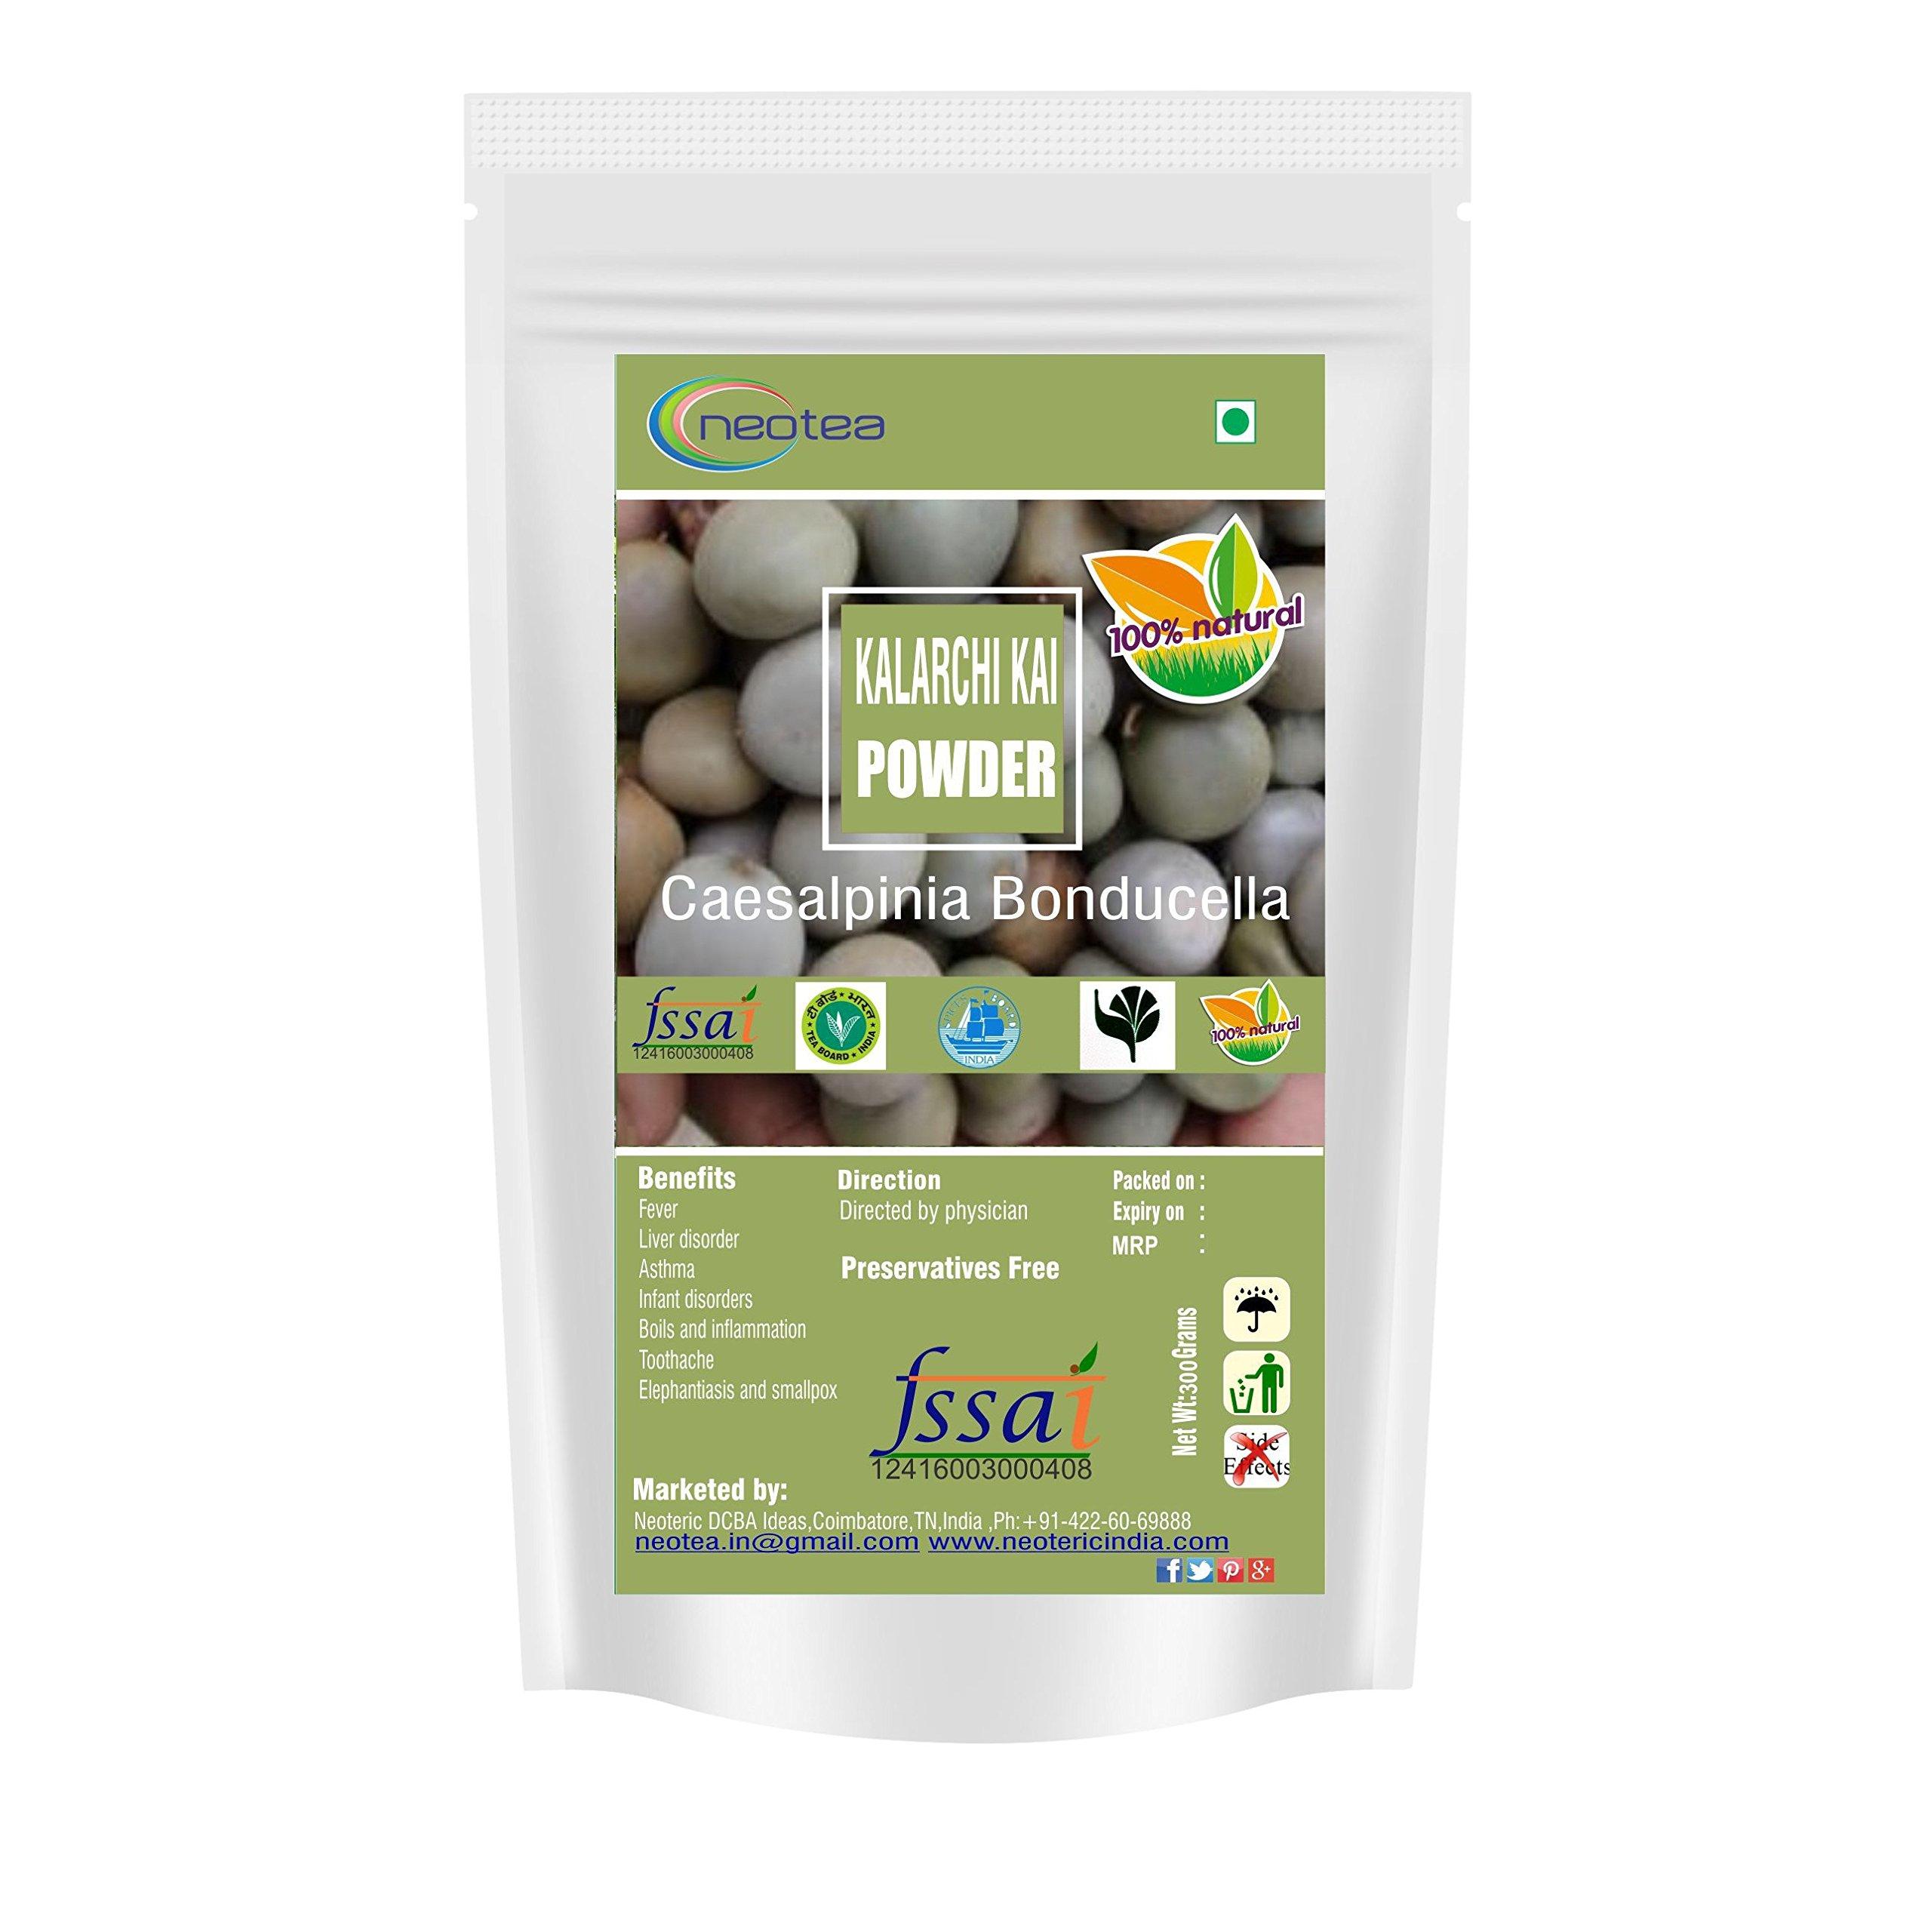 Neotea Bonduc Nut   Fever Nut   Caesalpinia Bonducella   Kalachikai Powder, 300gm